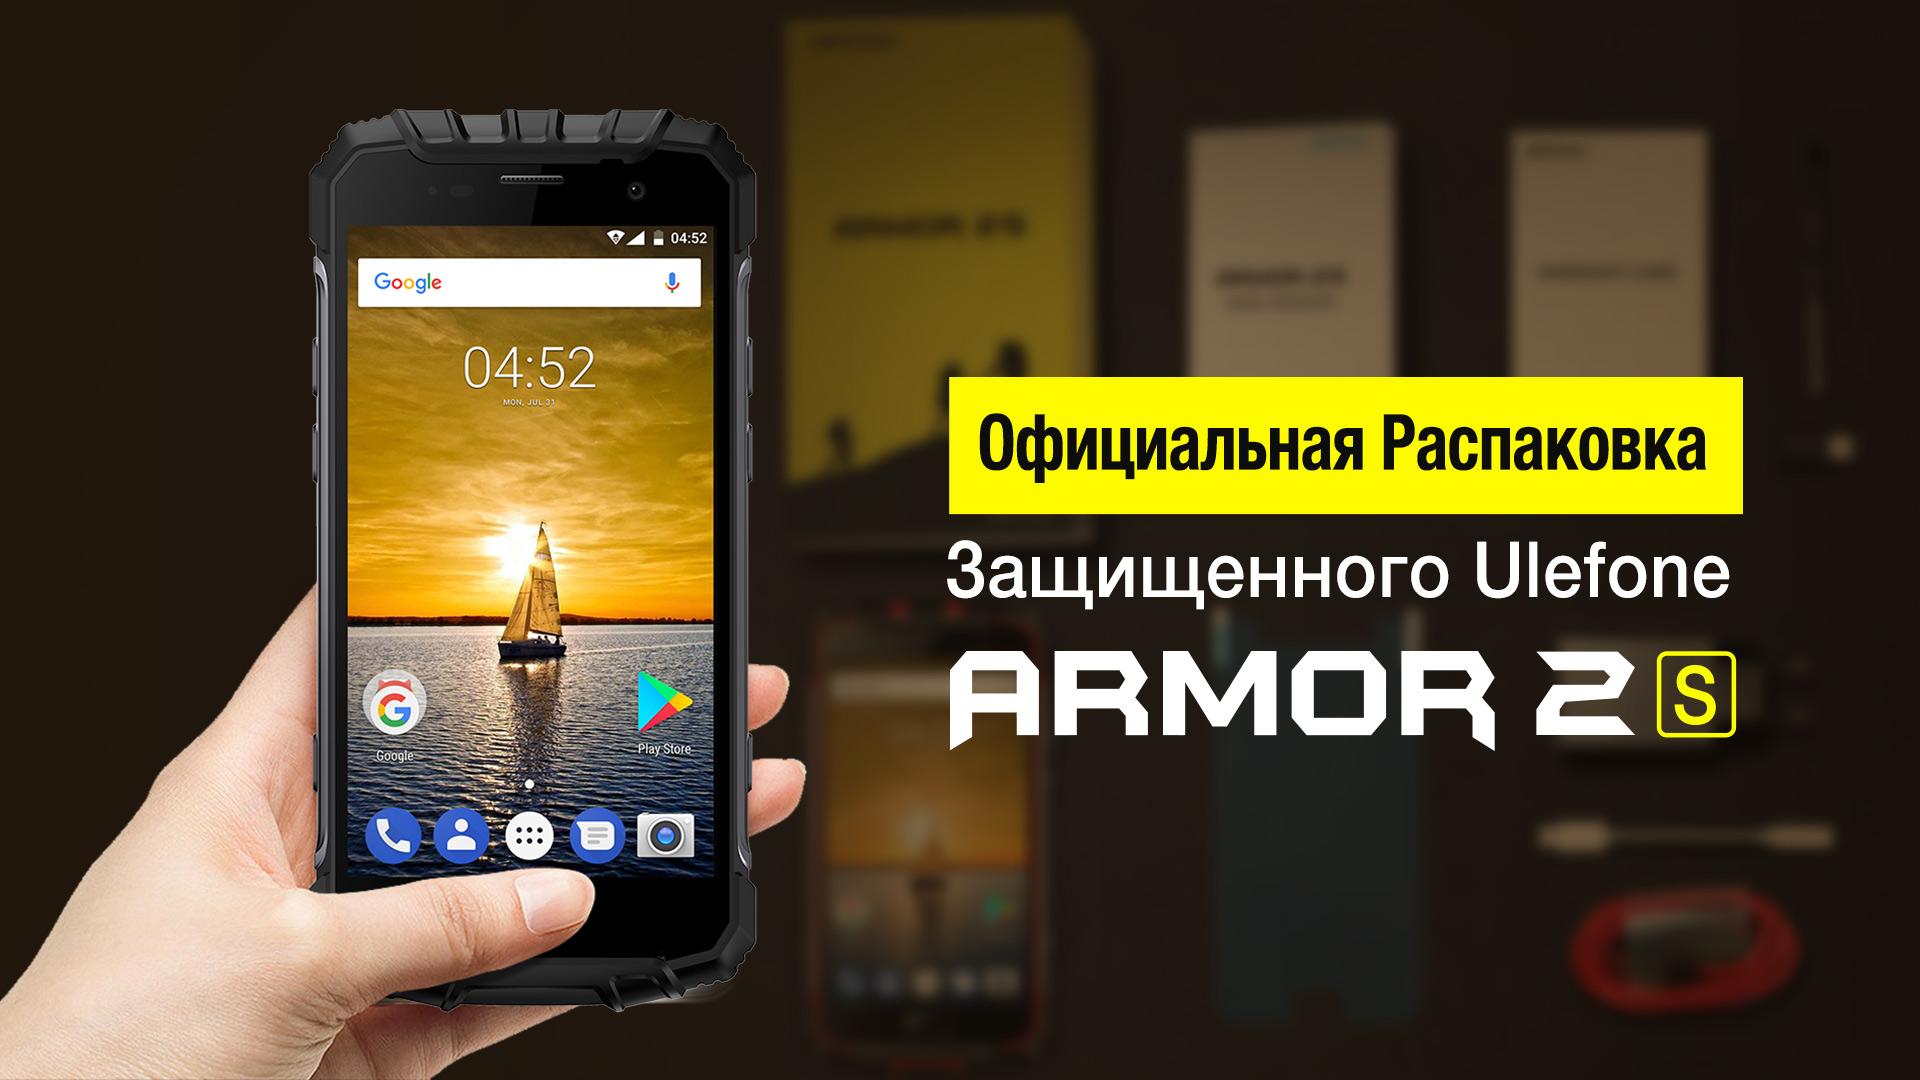 Особенности нового Ulefone Armor 2S